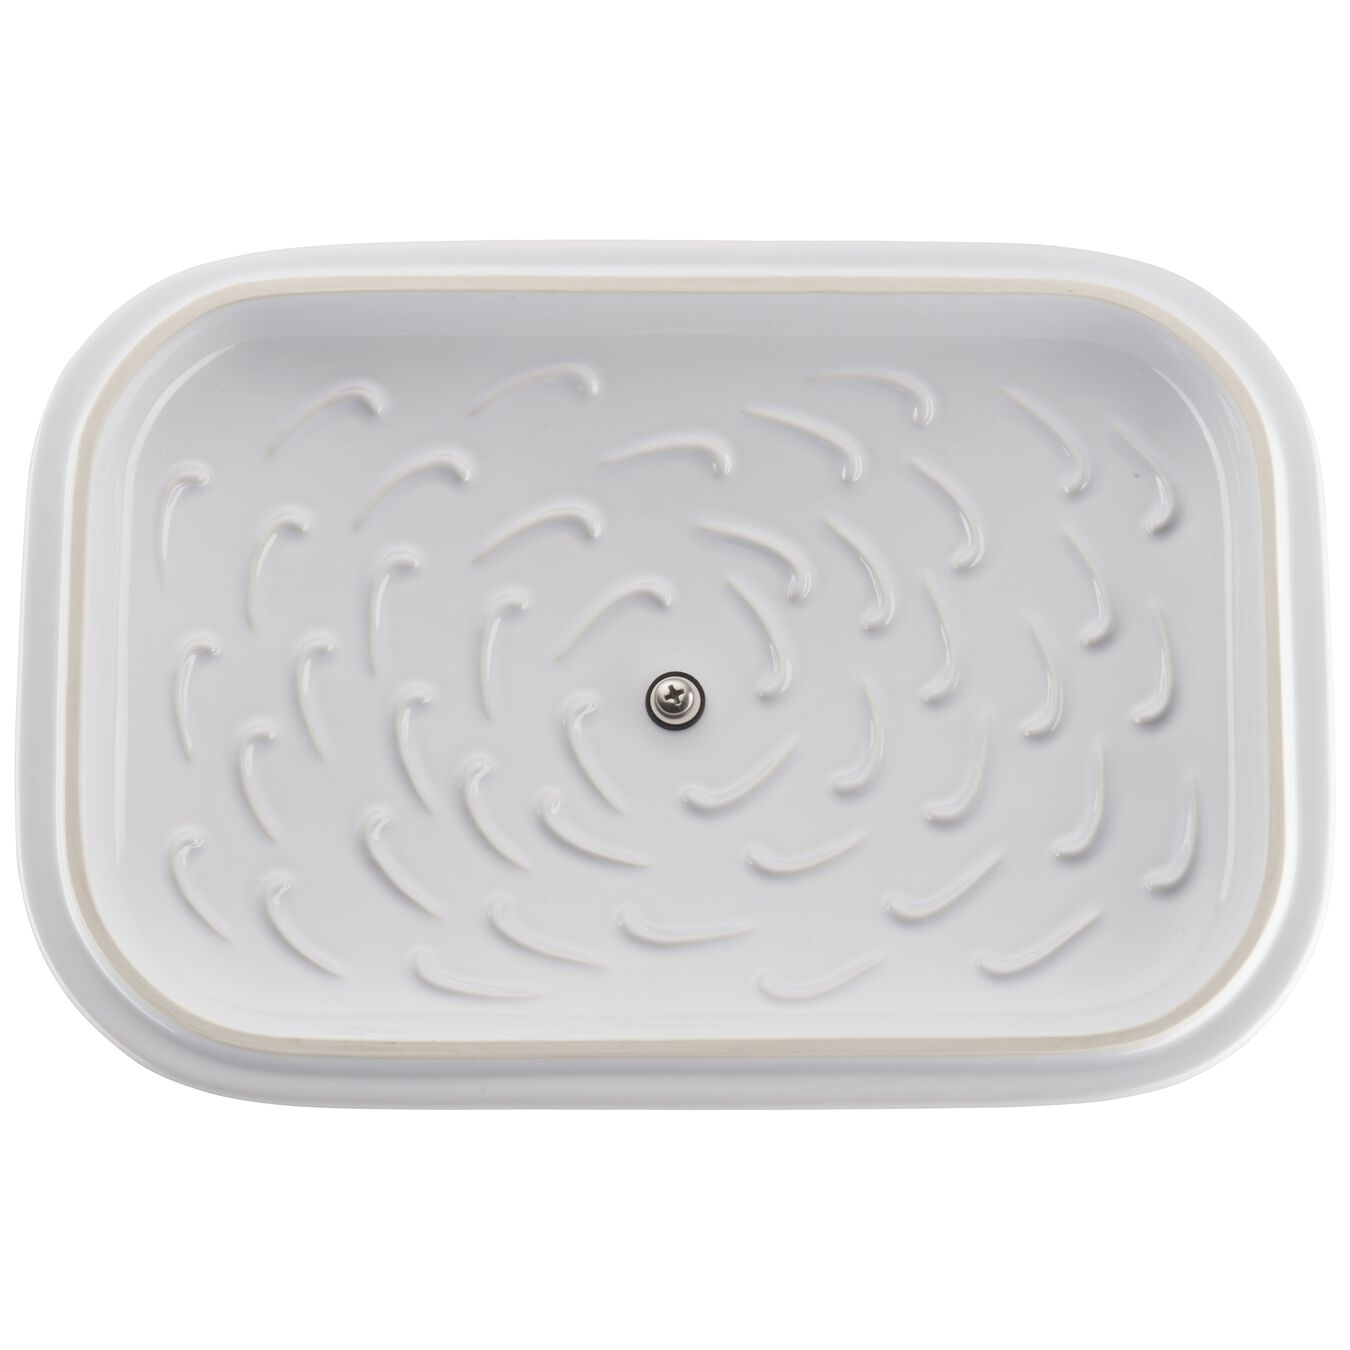 12-inch x 8-inch Rectangular Covered Baking Dish - White,,large 2